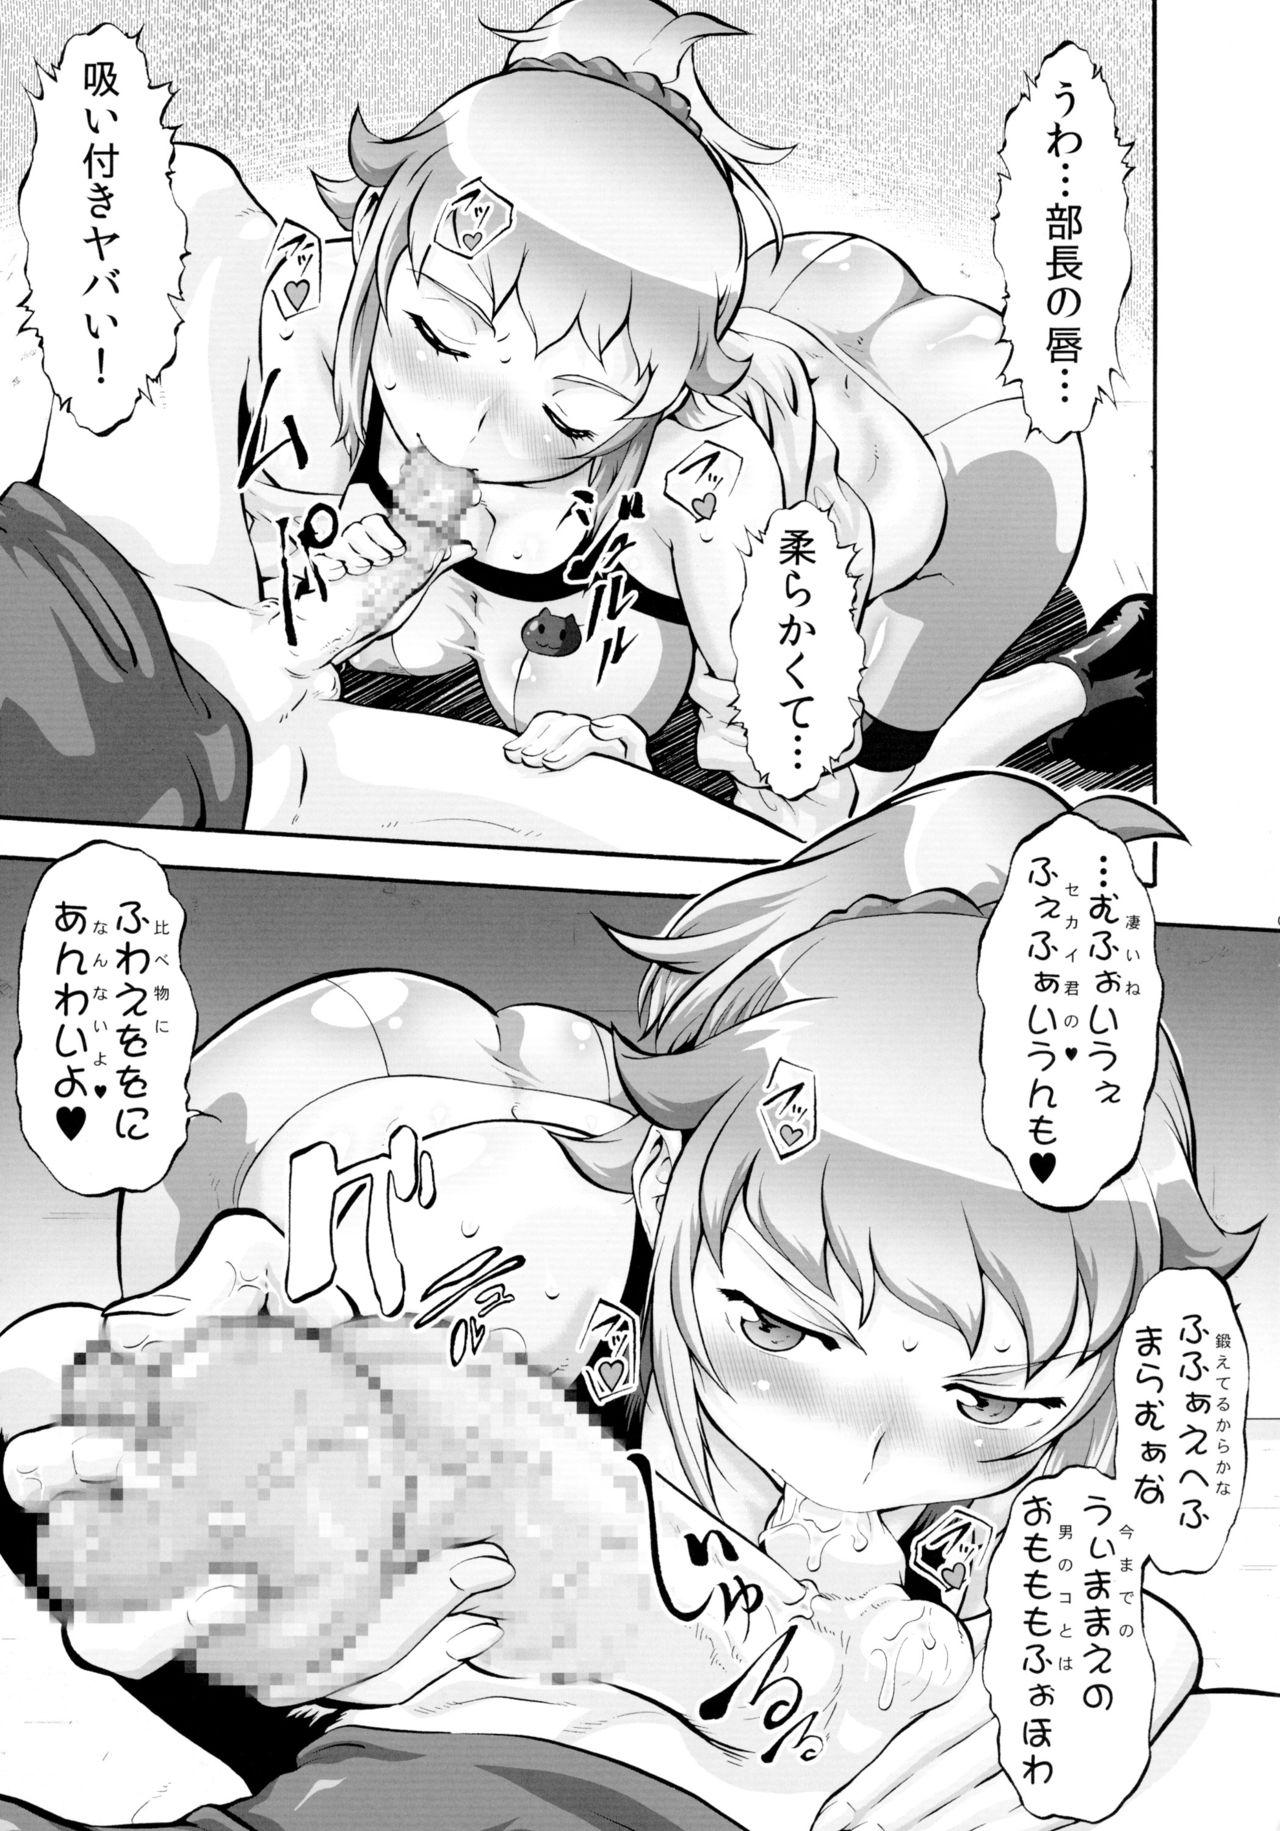 Oshiete Try-san 6